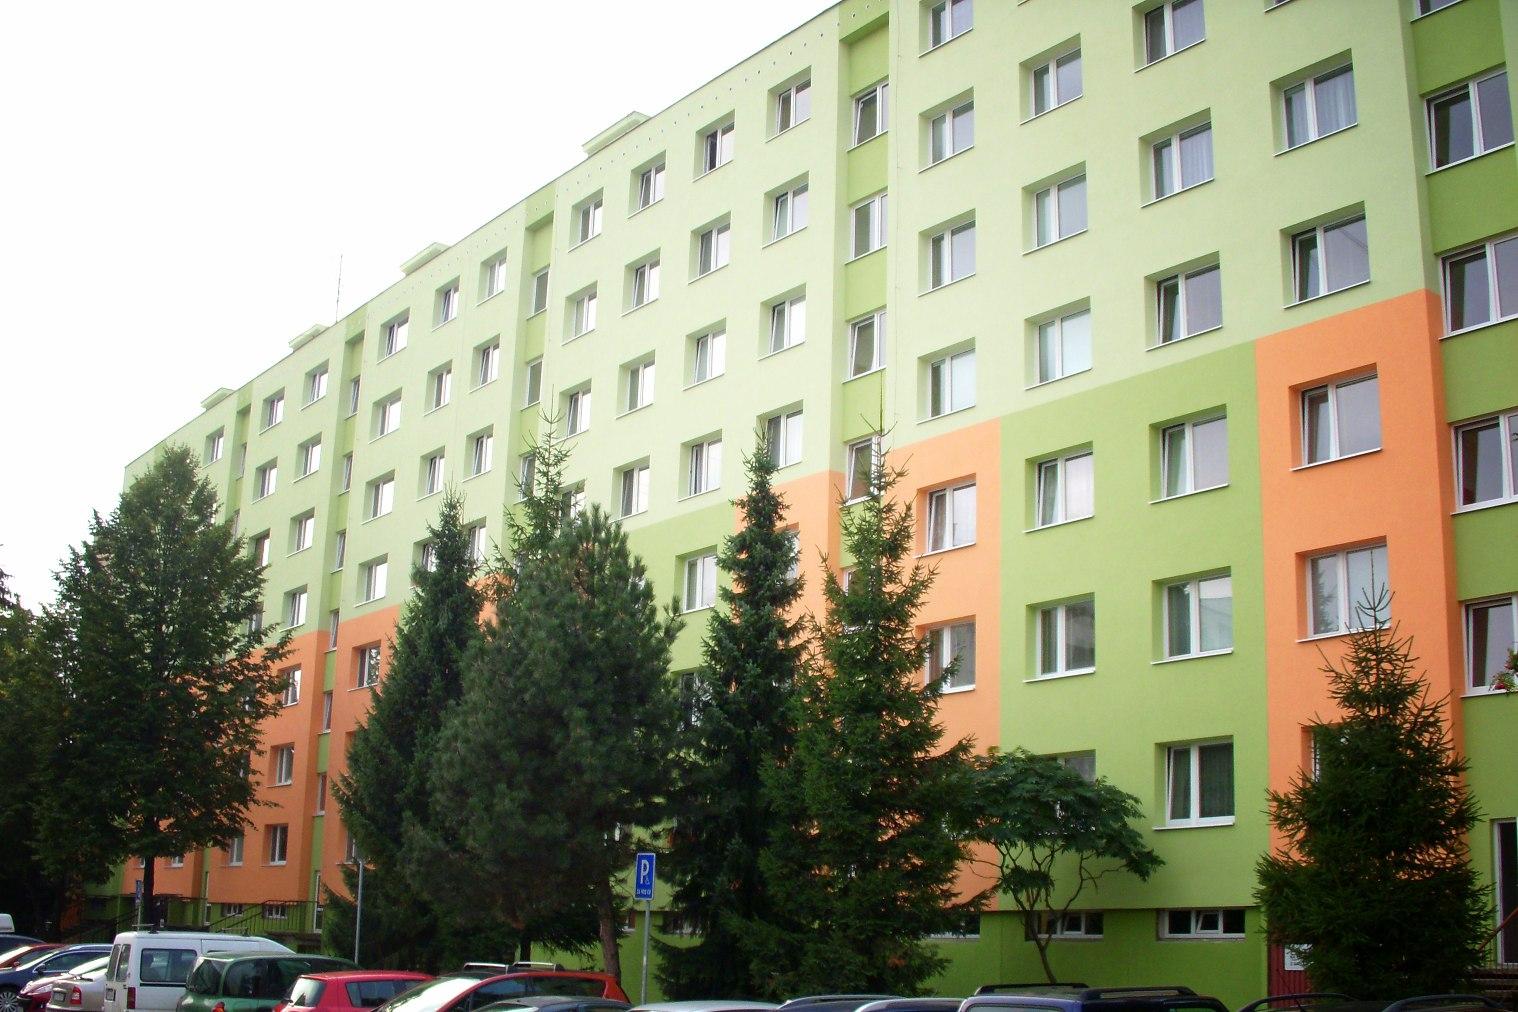 Kompletná obnova bytového domu Smrkeková, Žilina